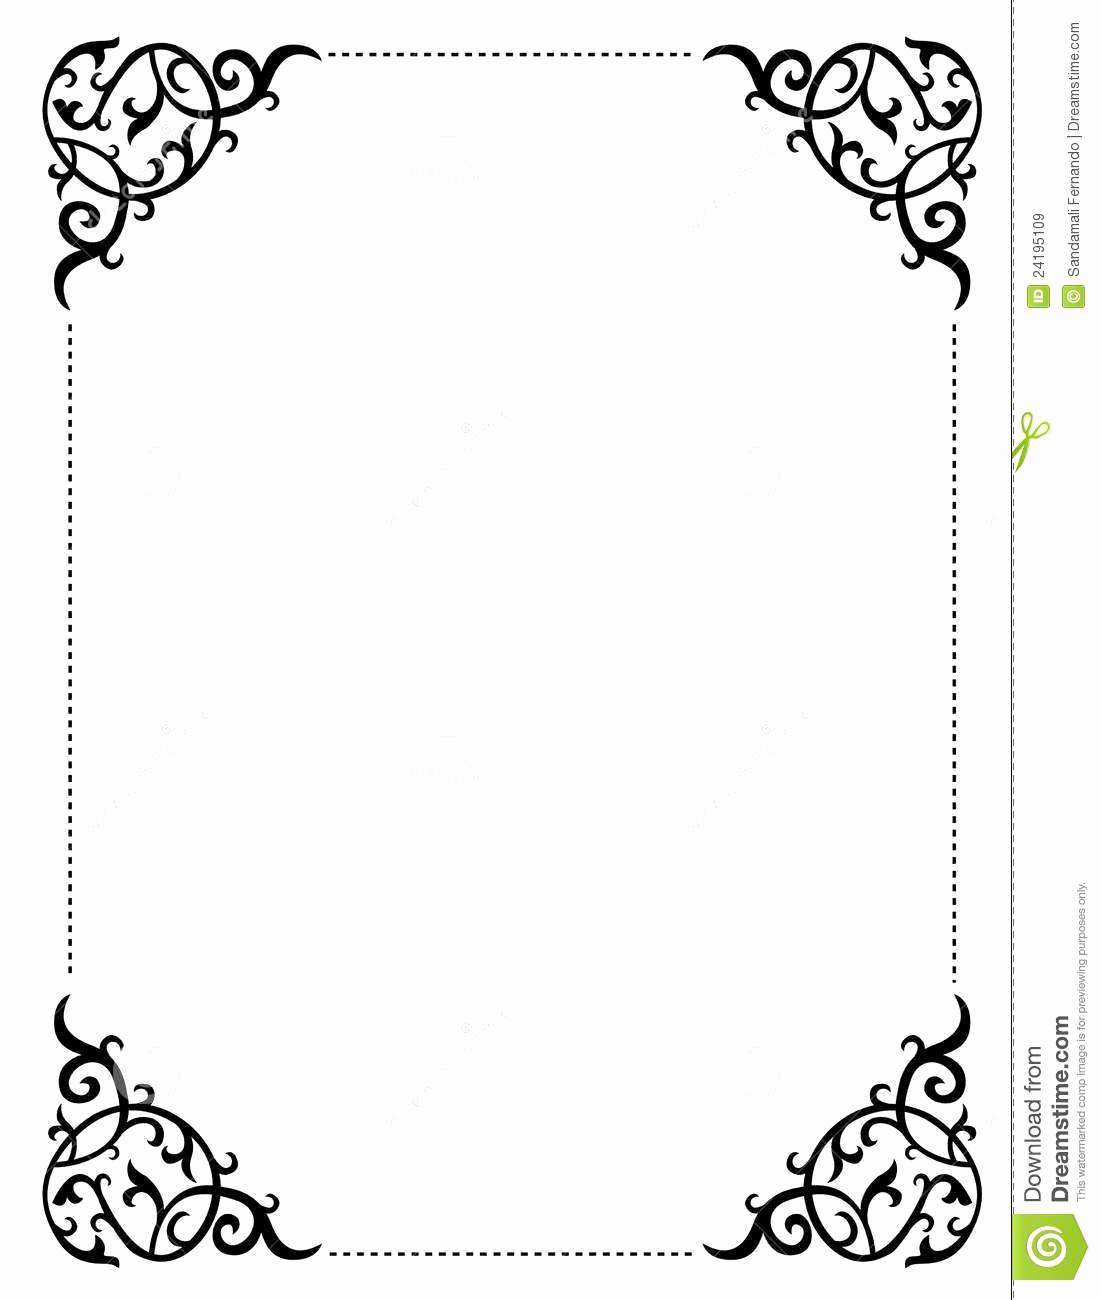 Wedding Invitation Border Designs Lovely Pin On Wedding Programs